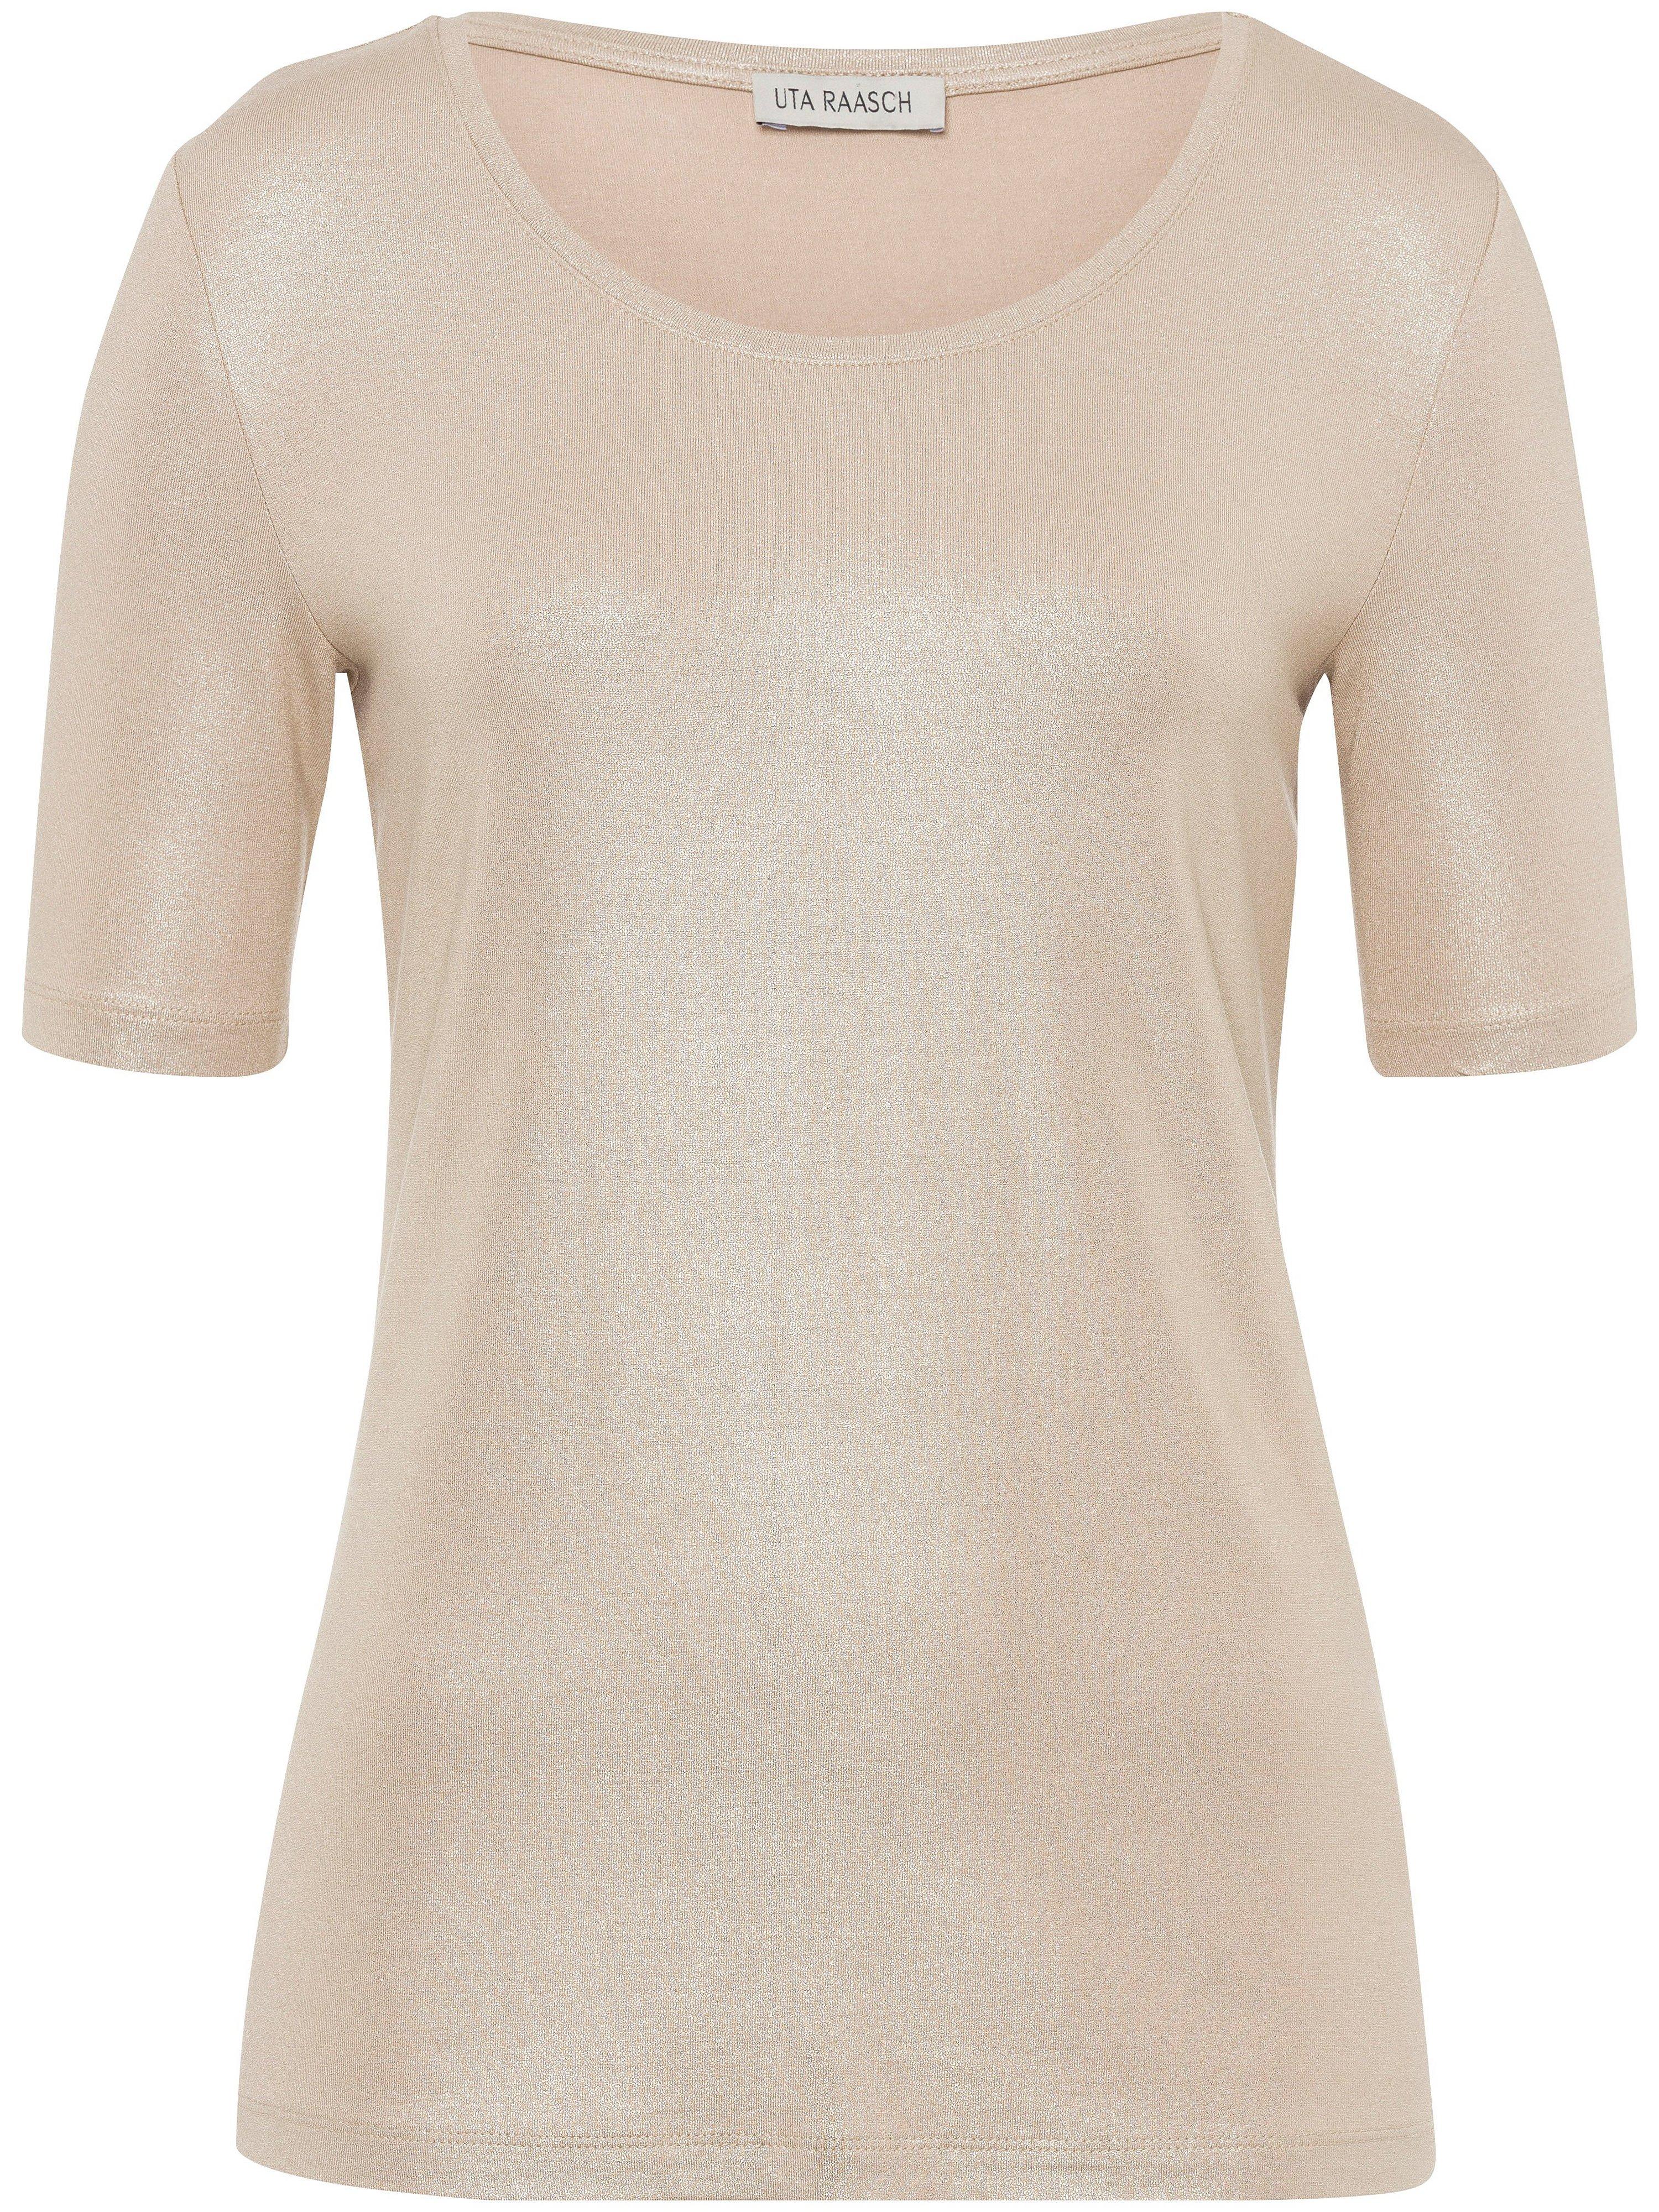 Round neck shirt Uta Raasch gold